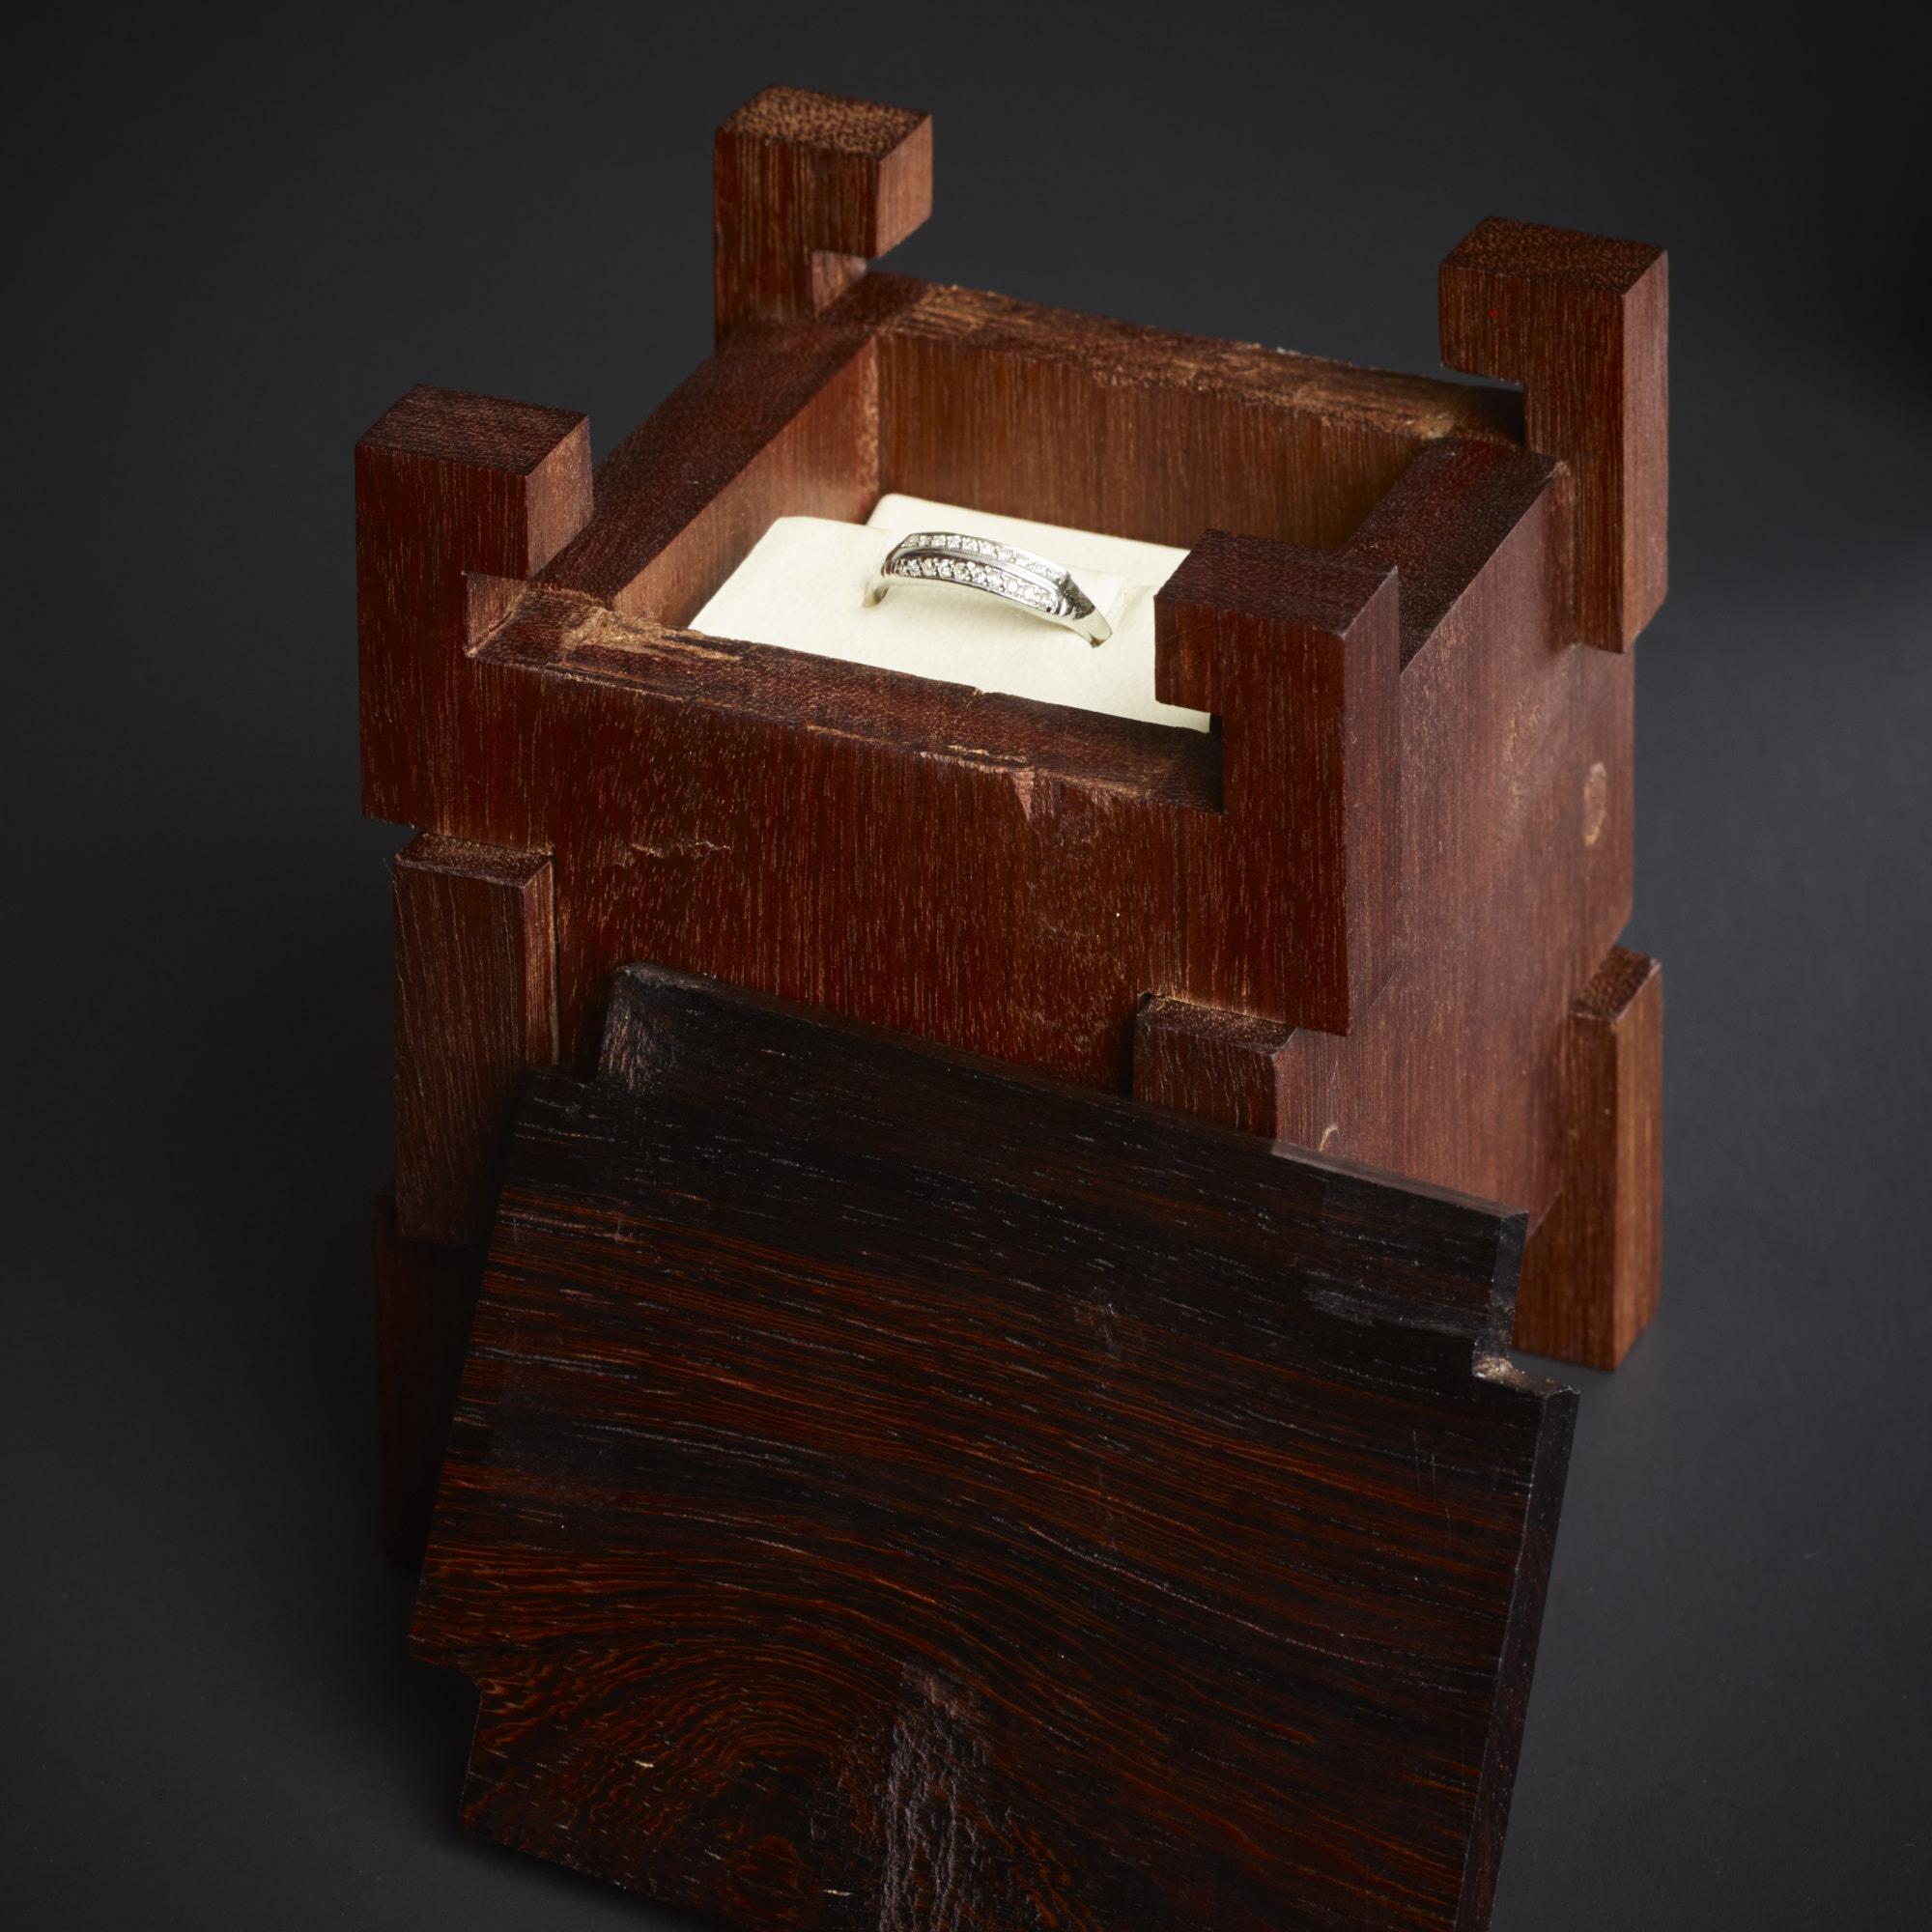 Harunobu Engagement Ring Box - 2014- HapaInaba Designs- Open- lid front.jpg